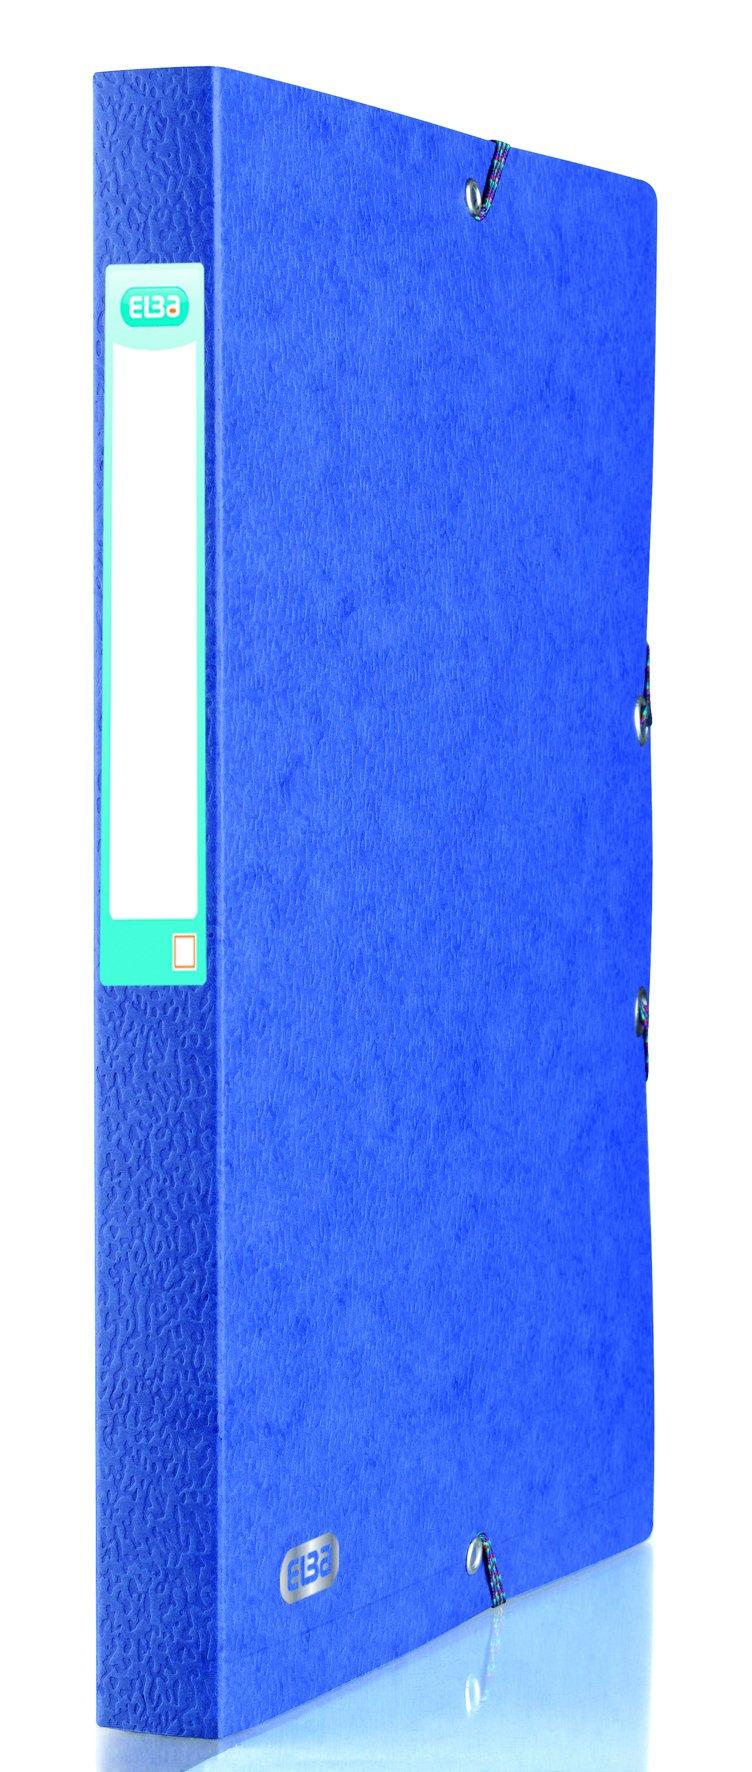 Elba Eurofolio Filing Box Pressboard 25mm Capacity Elasticated Closure A4 Blue Ref A45000031 [Pack 10]